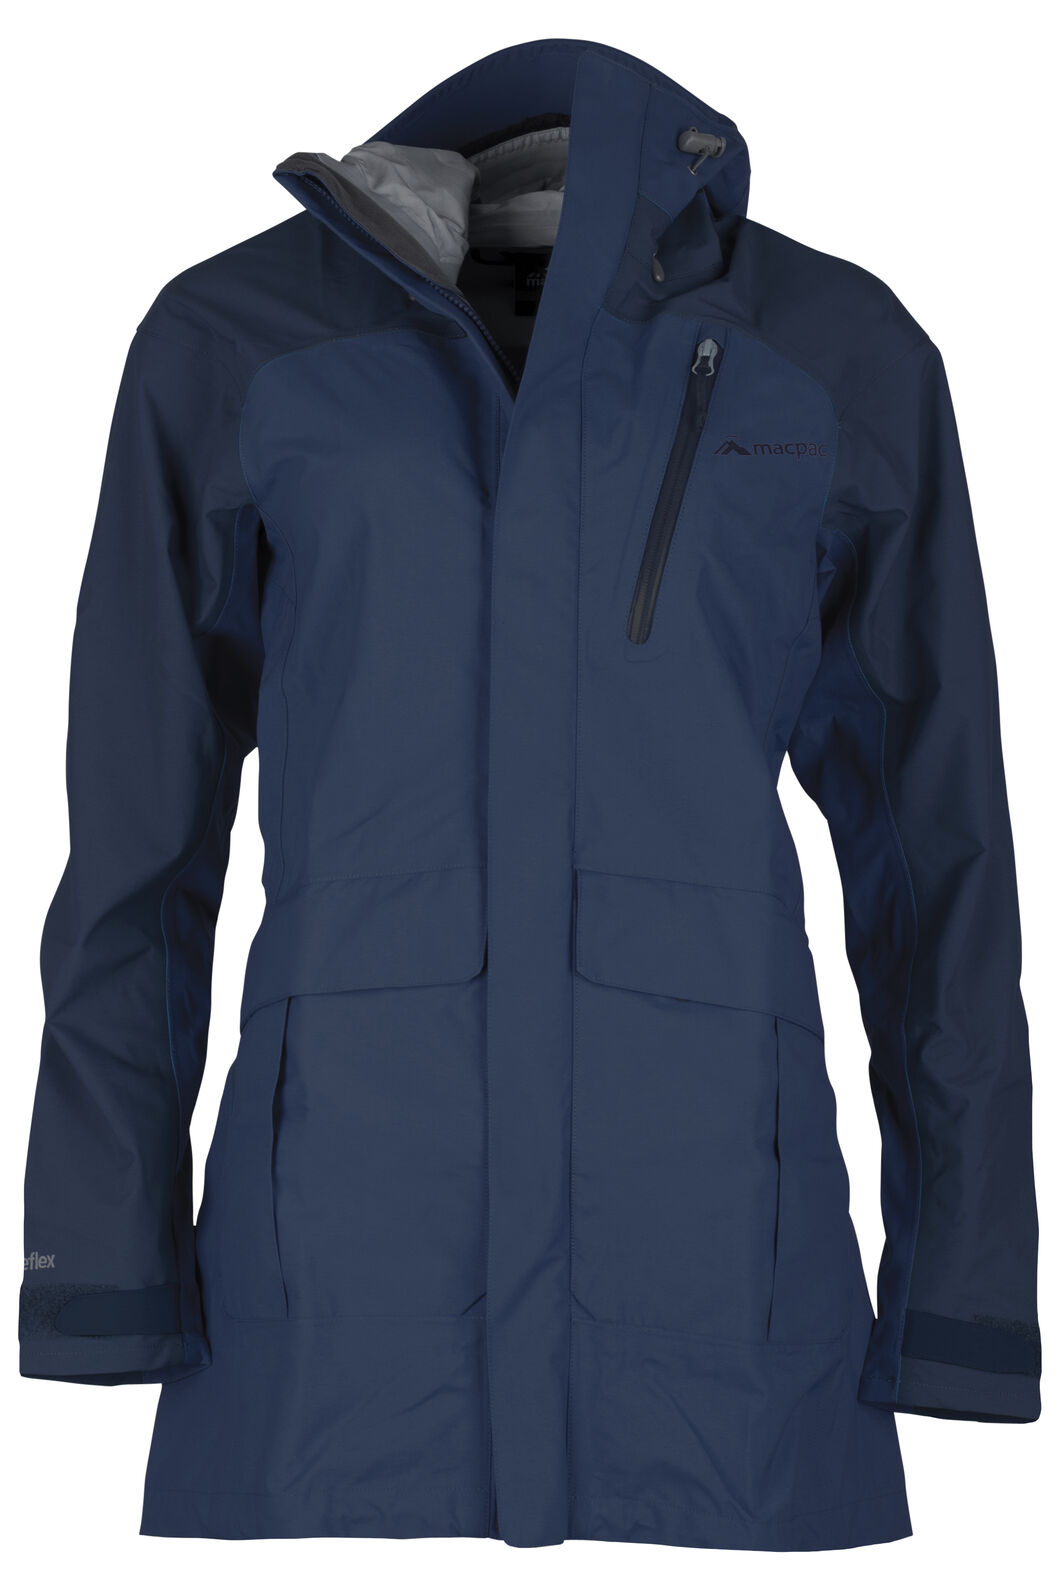 Copland Long Rain Jacket - Women's, Estate Blue/Black Iris, hi-res